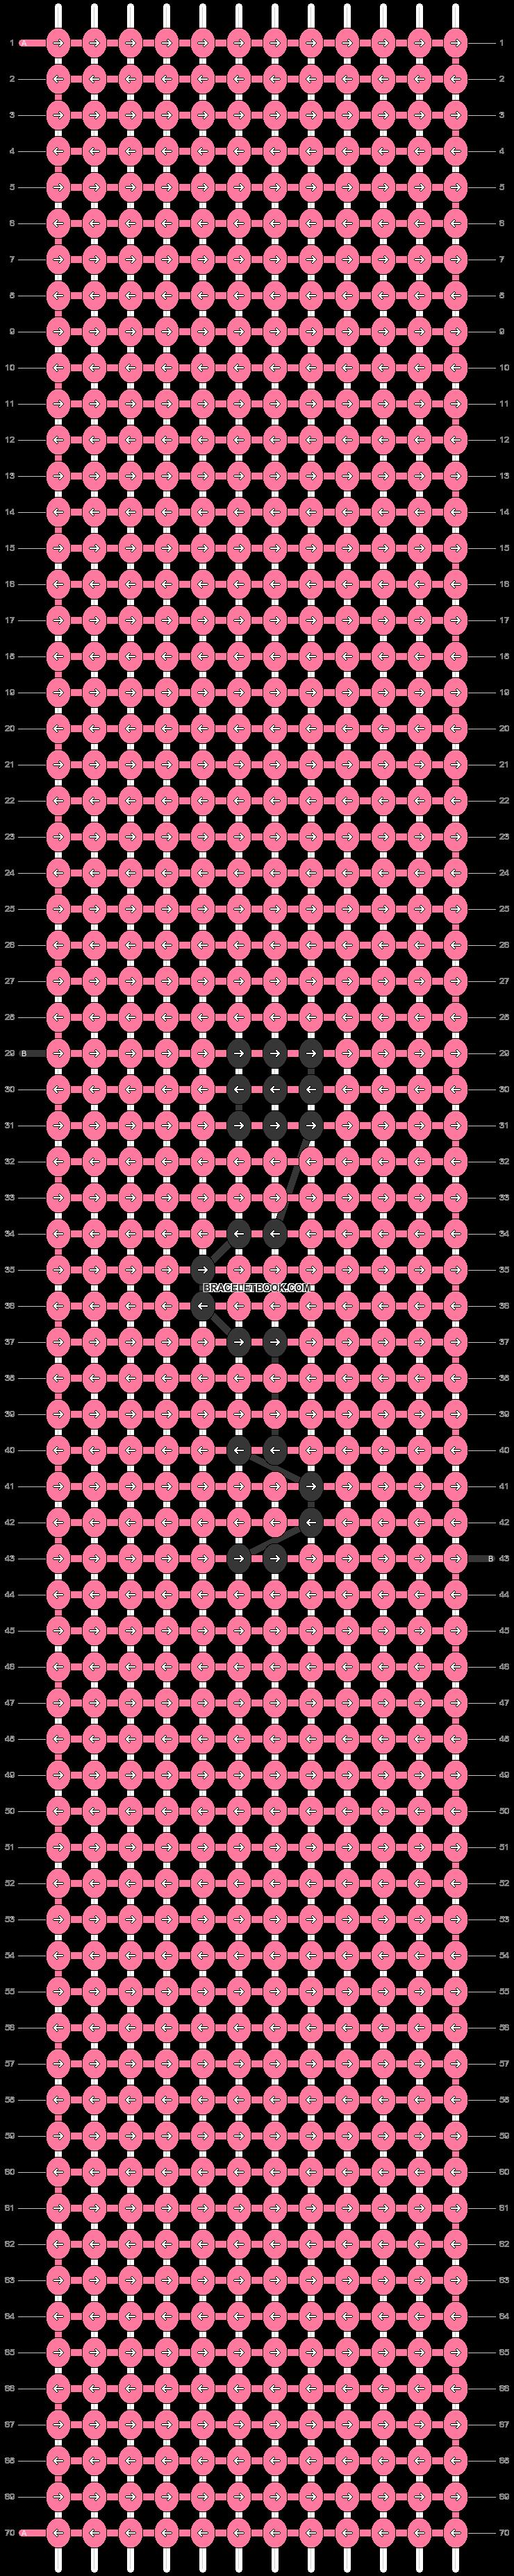 Alpha pattern #45846 pattern